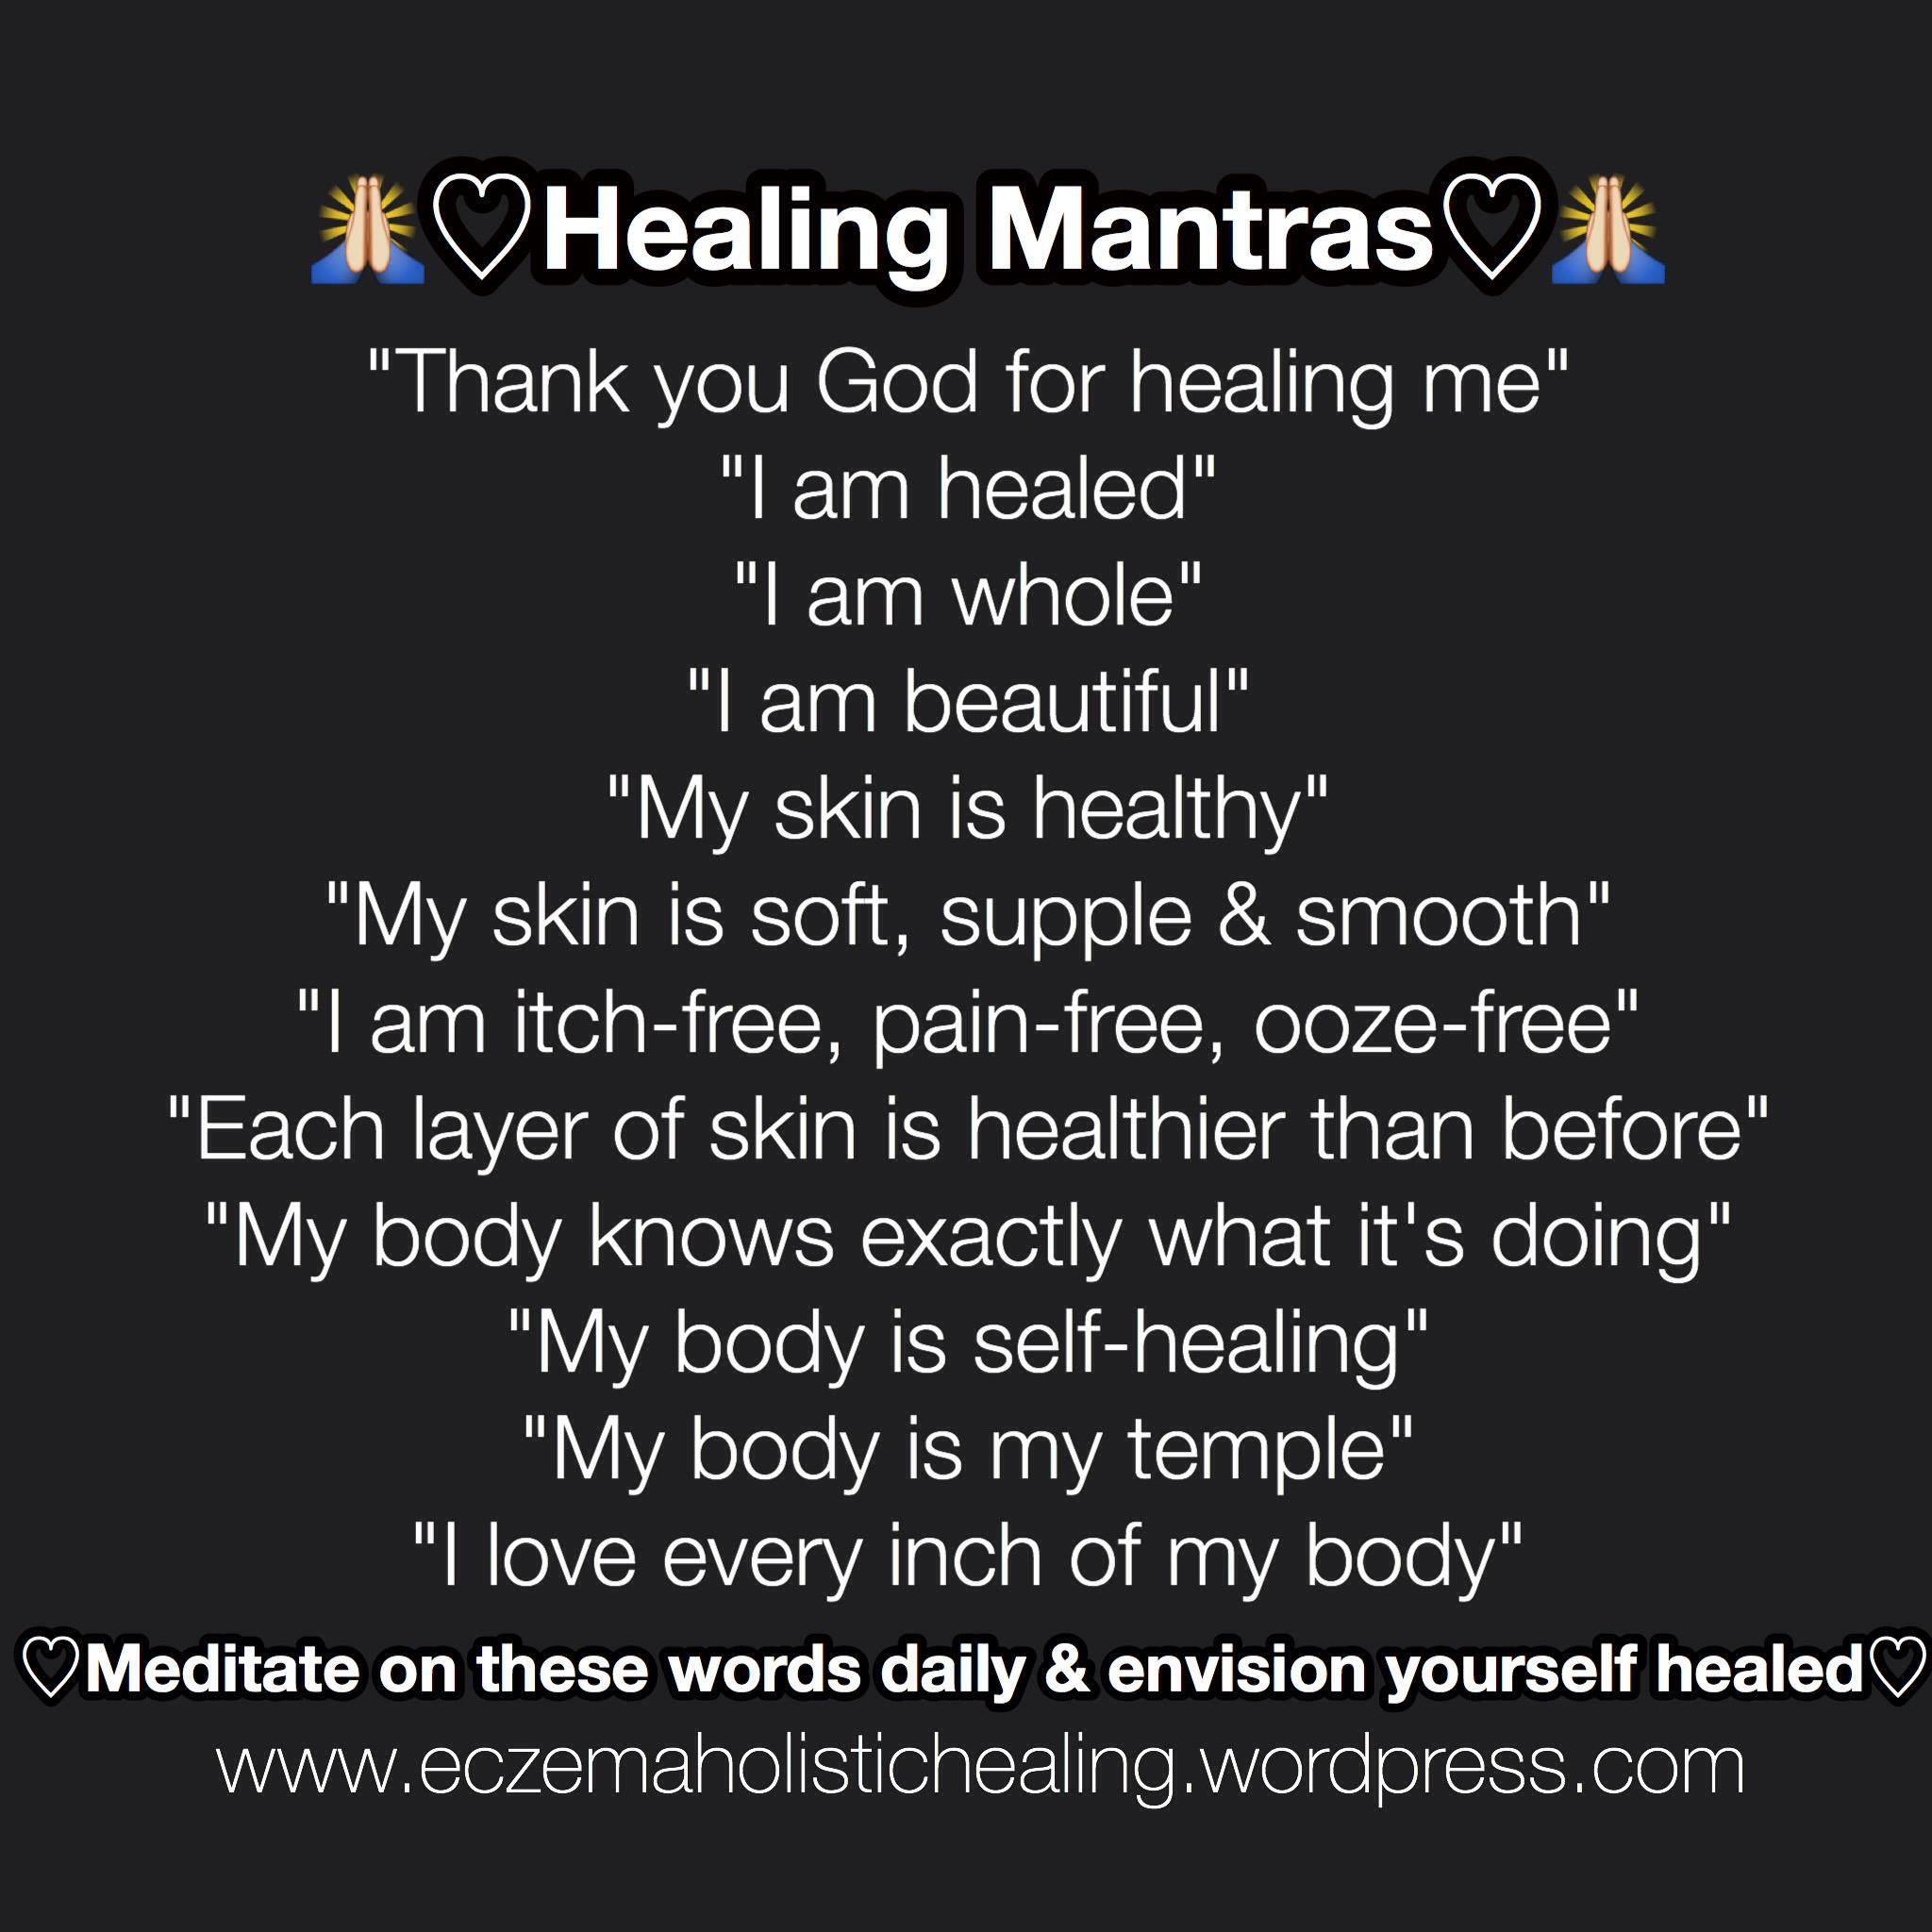 Healing Mantras – Eczema Holistic Healing